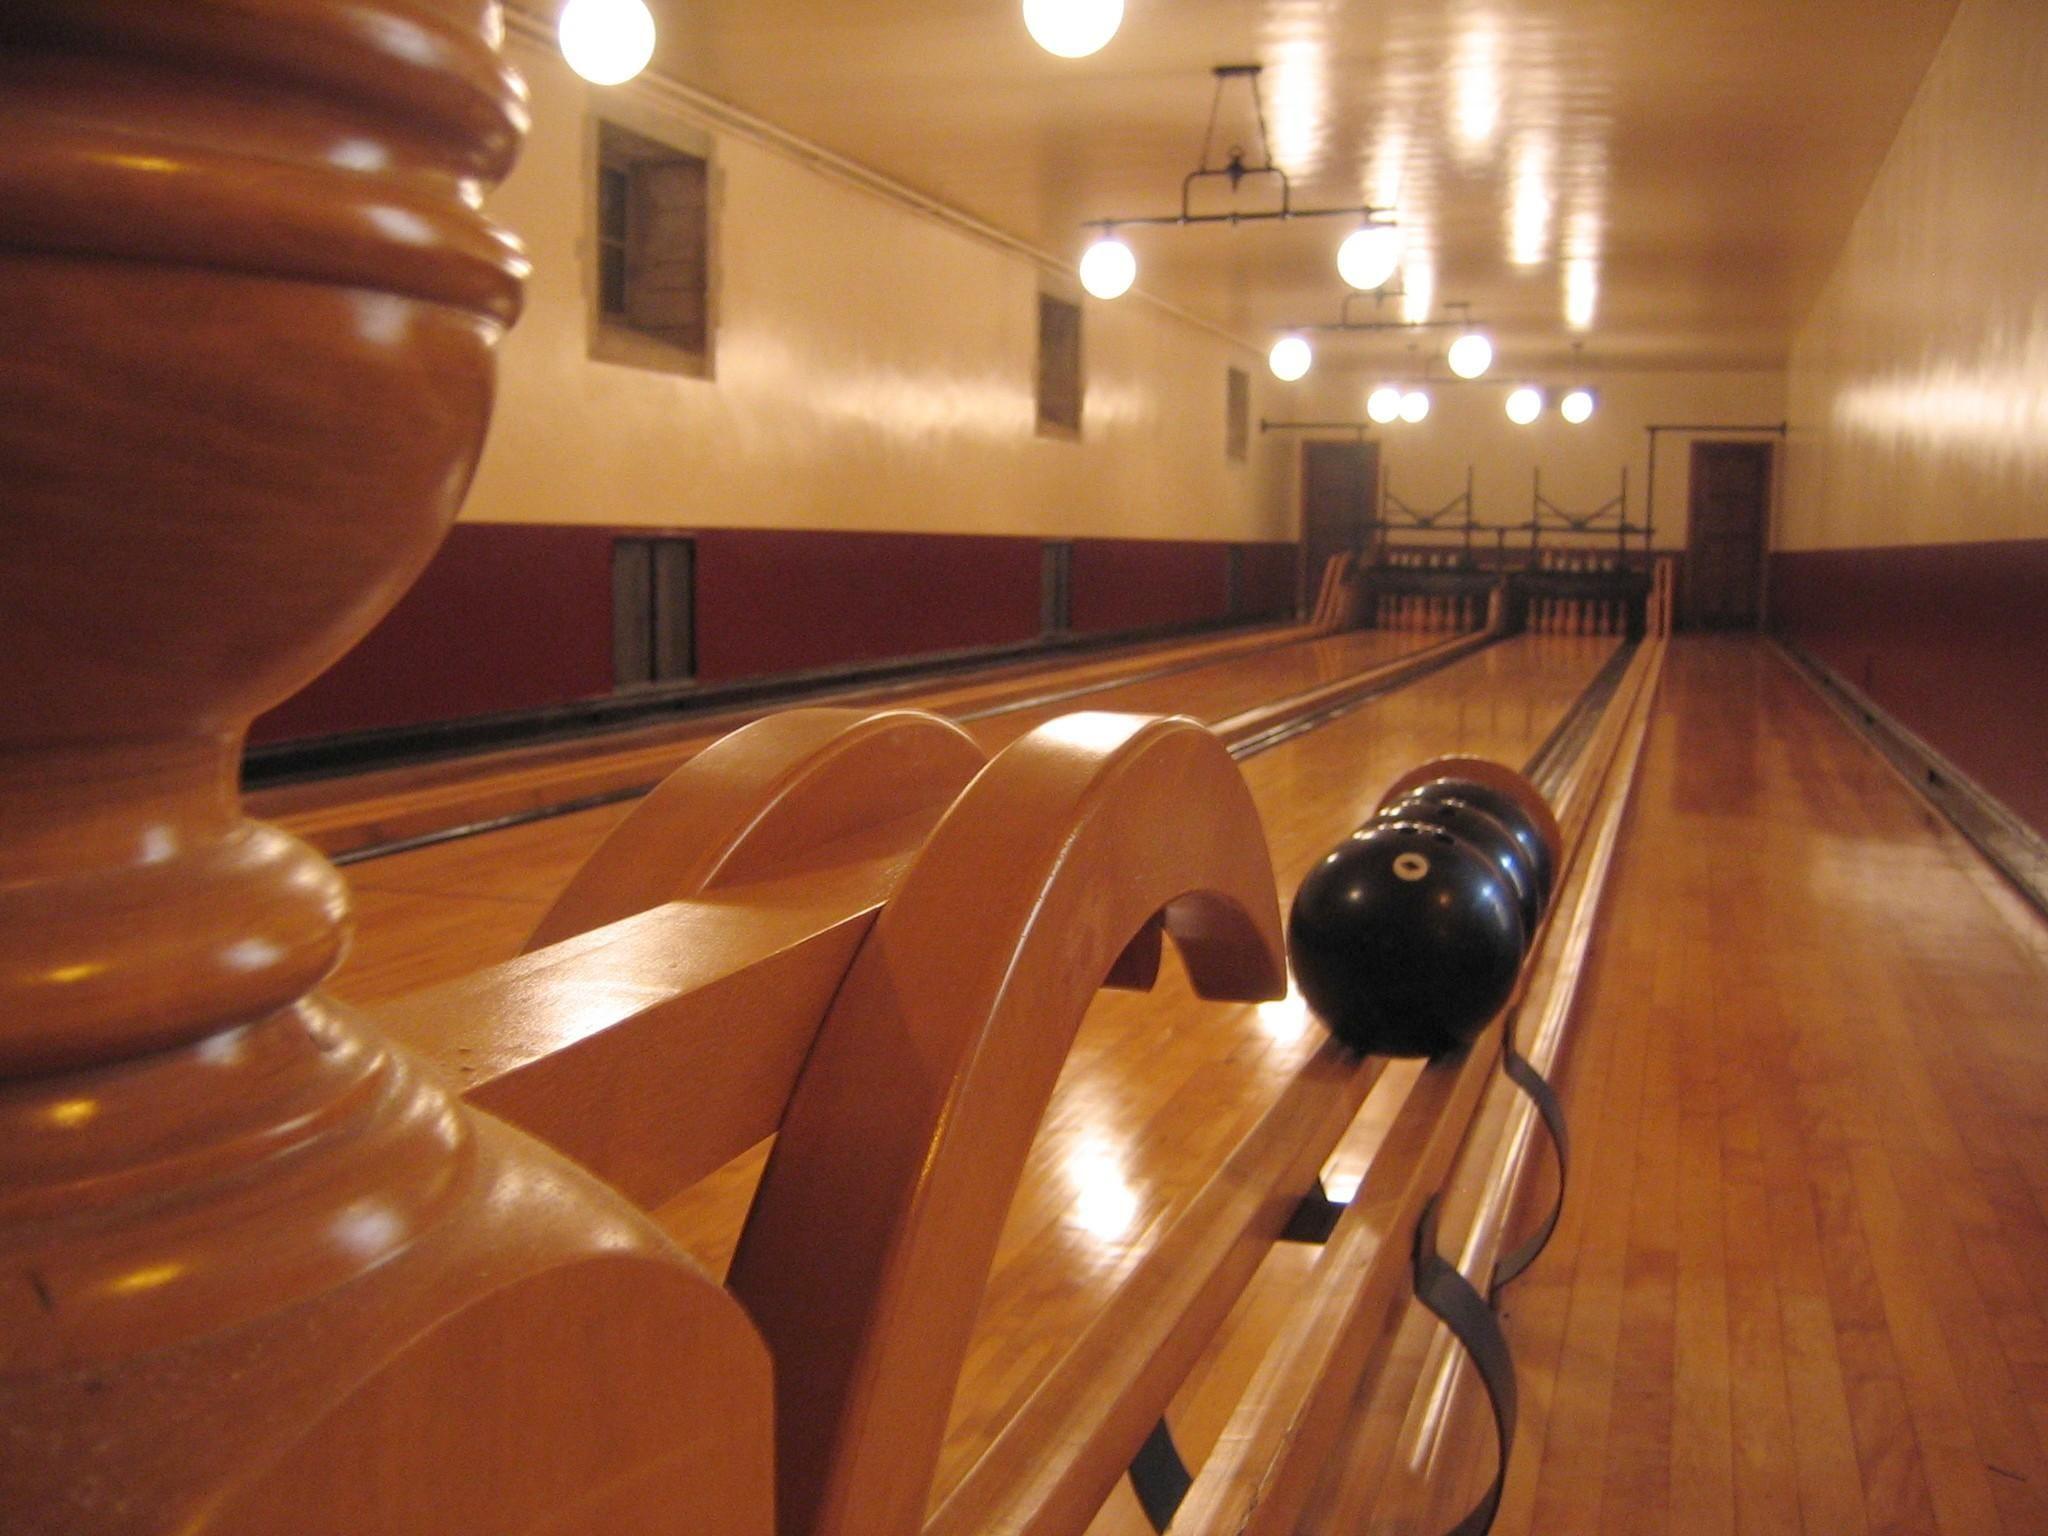 Greystone Wallpapers High Definition Wallpaper Edison Light Bulbs Bowling